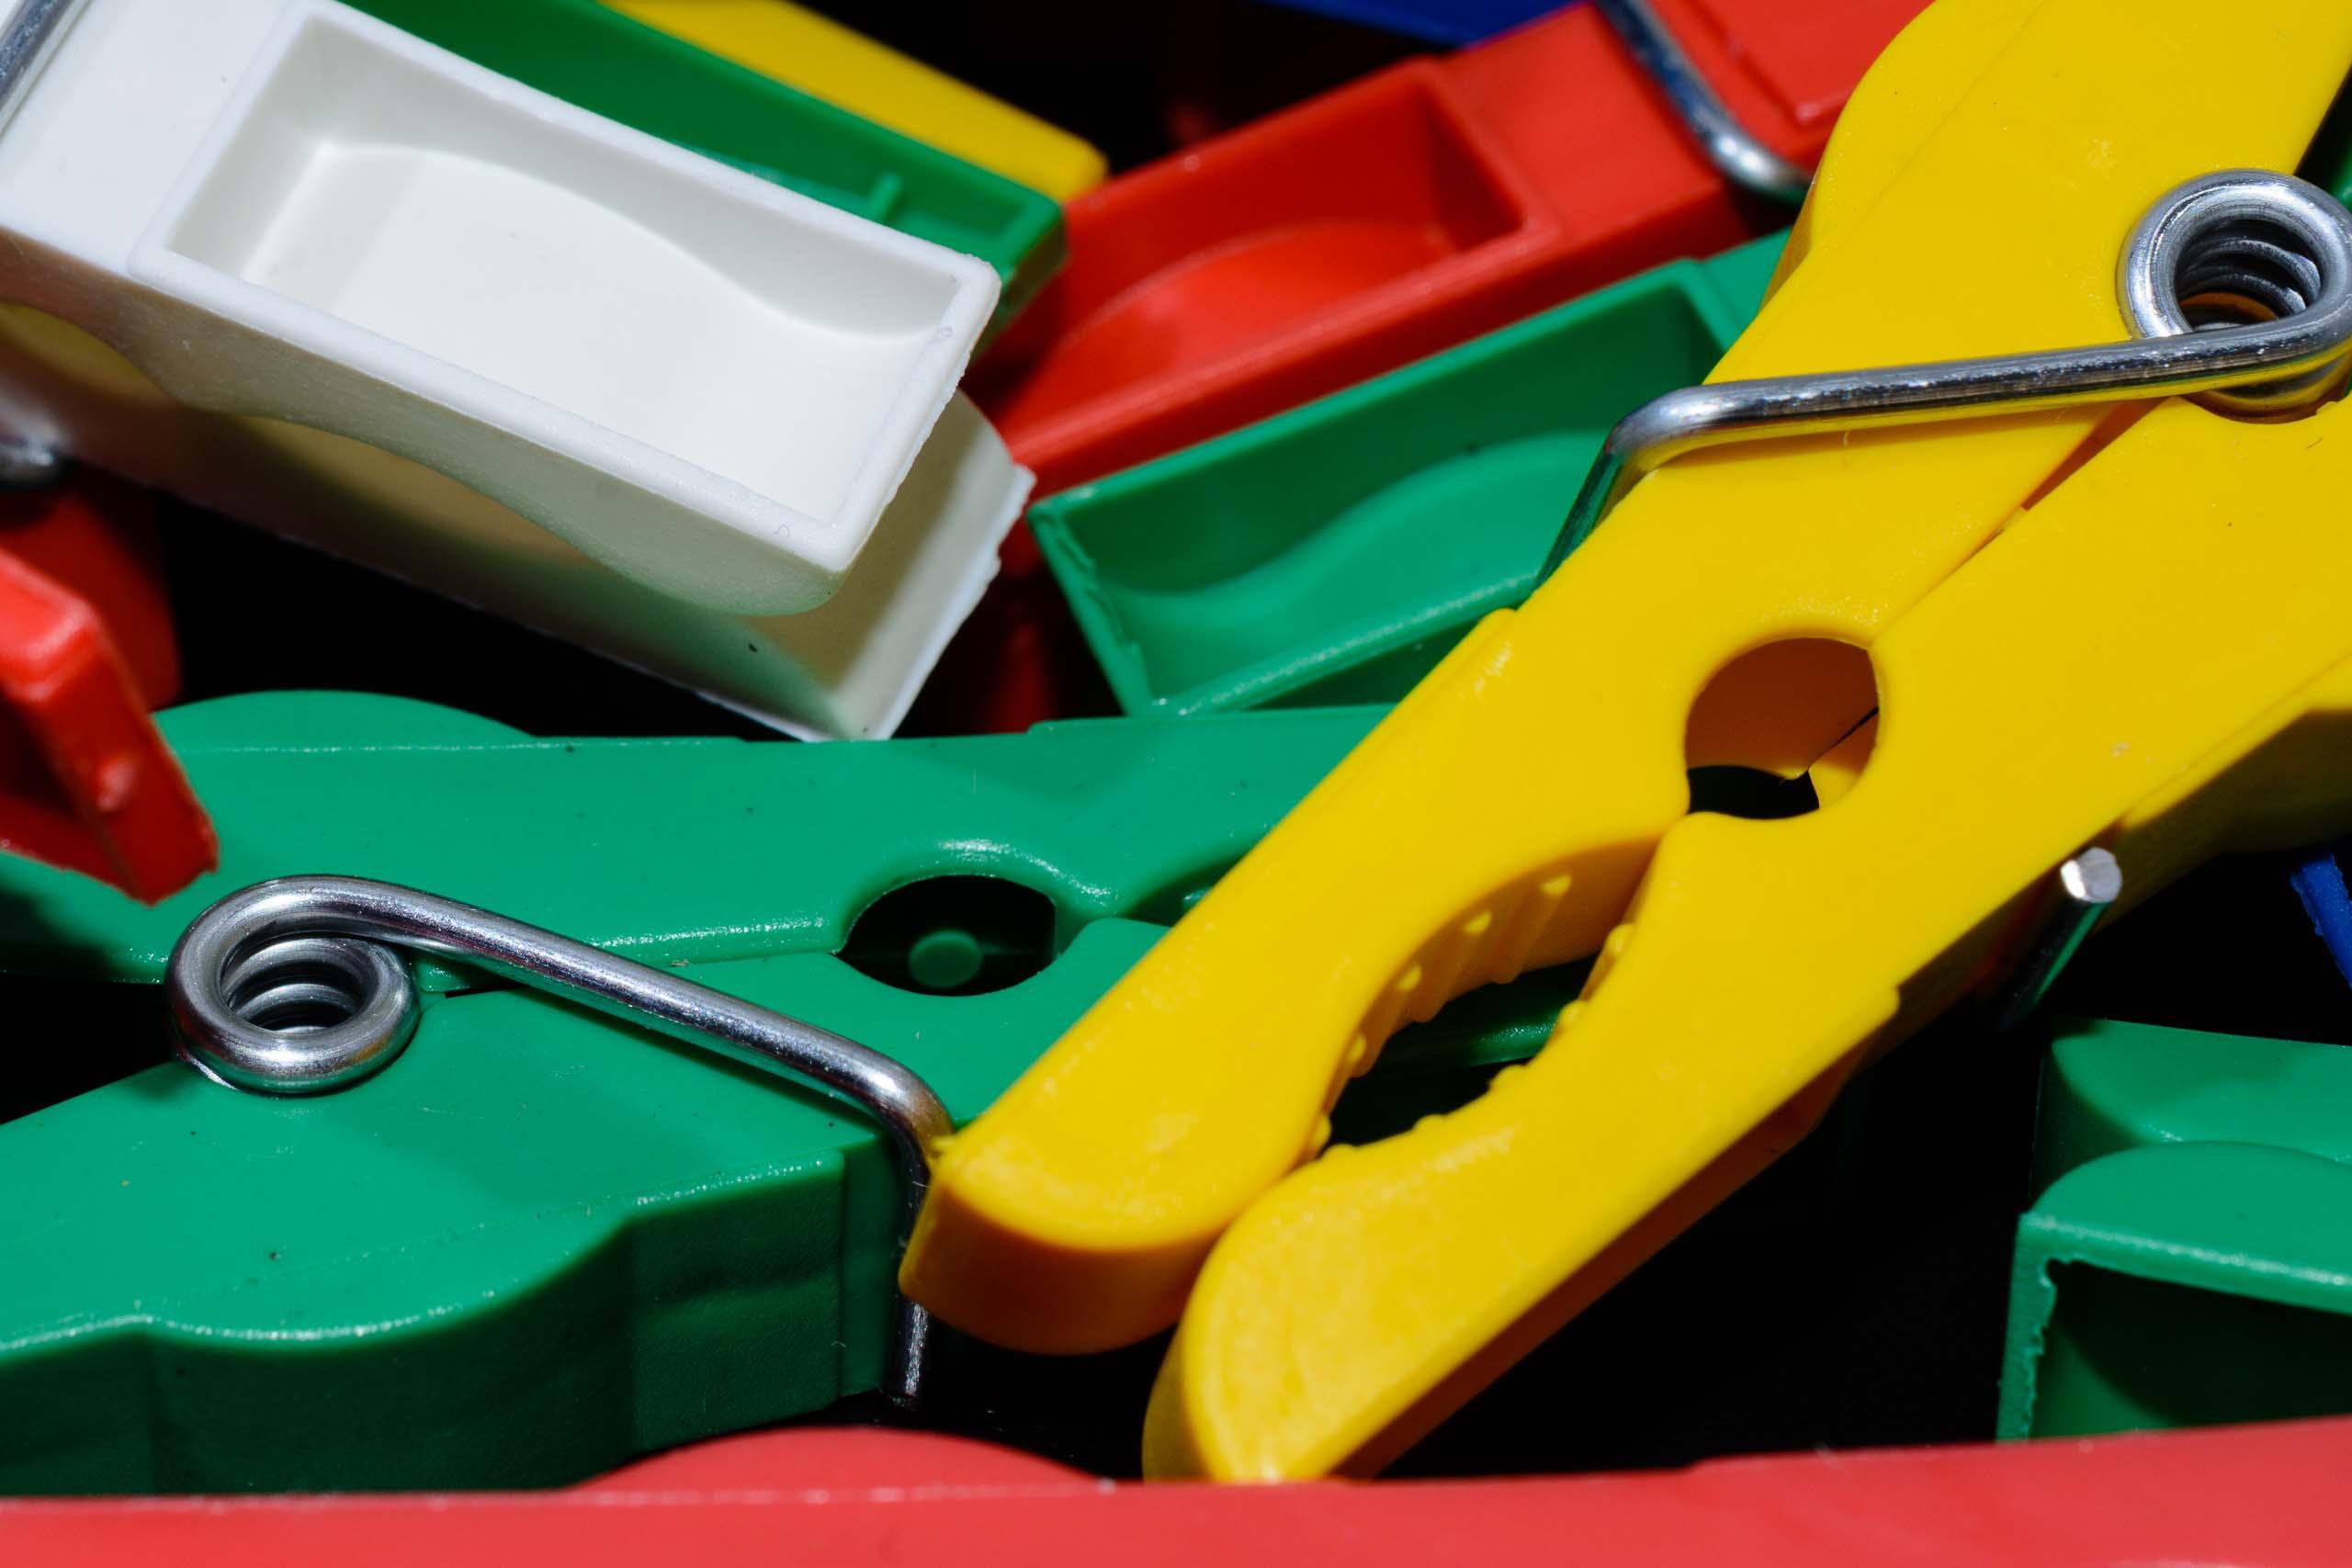 farbig,bunt,waescheklammer,details,nahaufnahme,makro